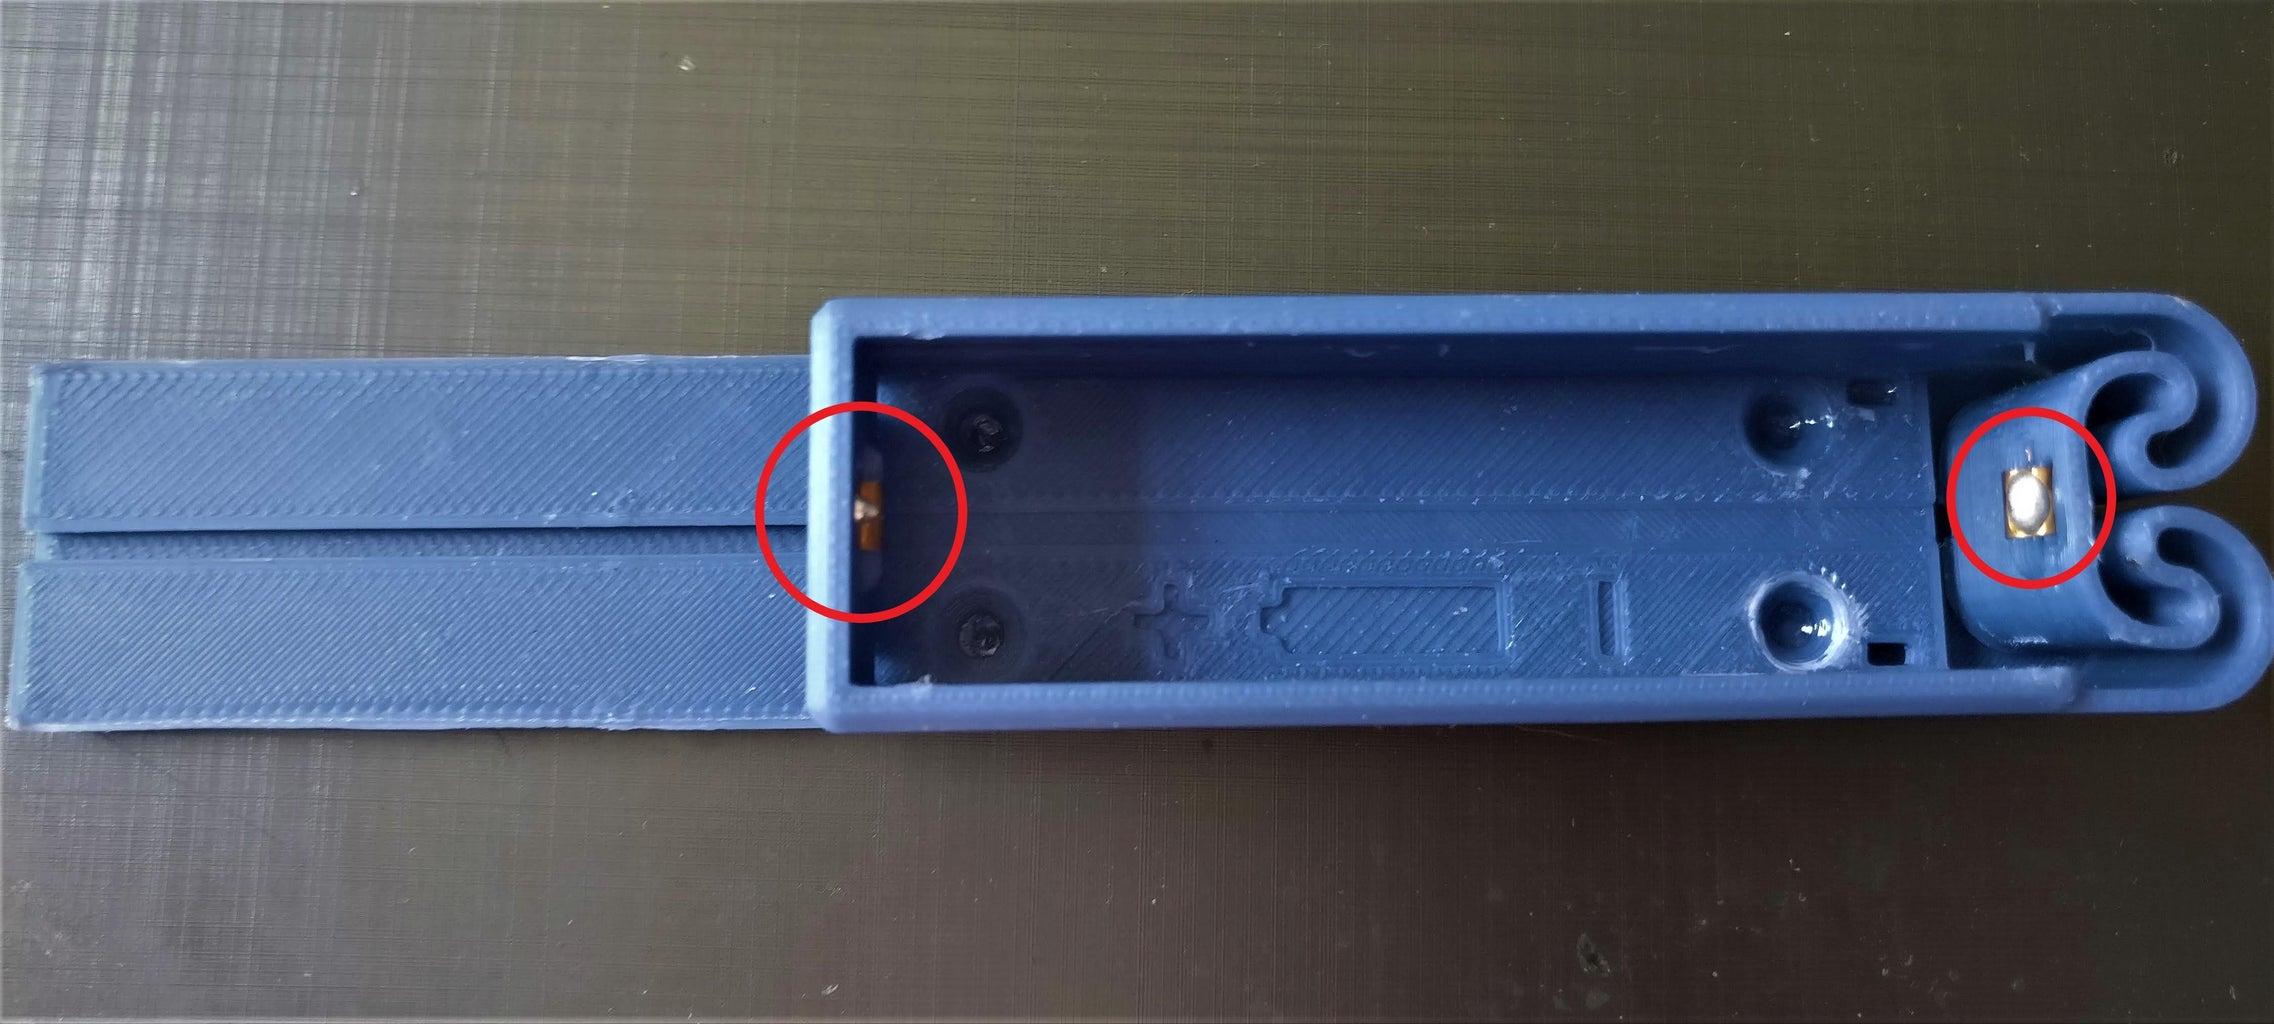 Controller Contruction Step 1: